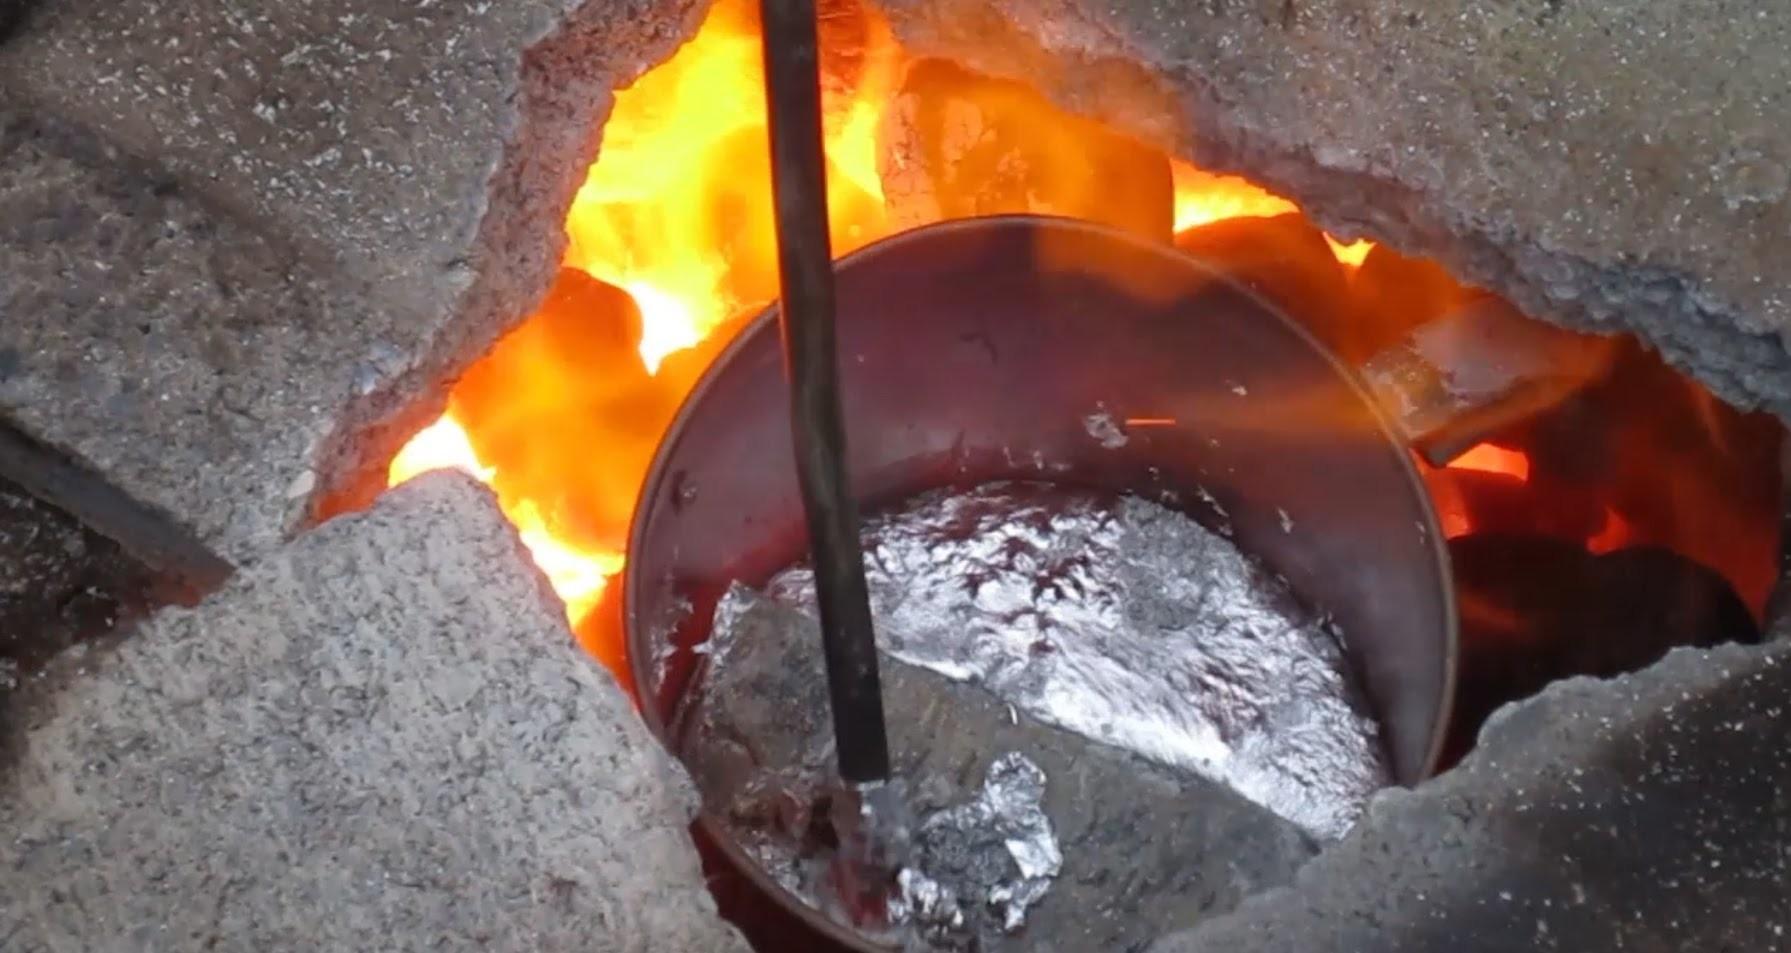 Turn 3d Prints Into Aluminum w. DIY Blast Furnace - Part 2 Preparation